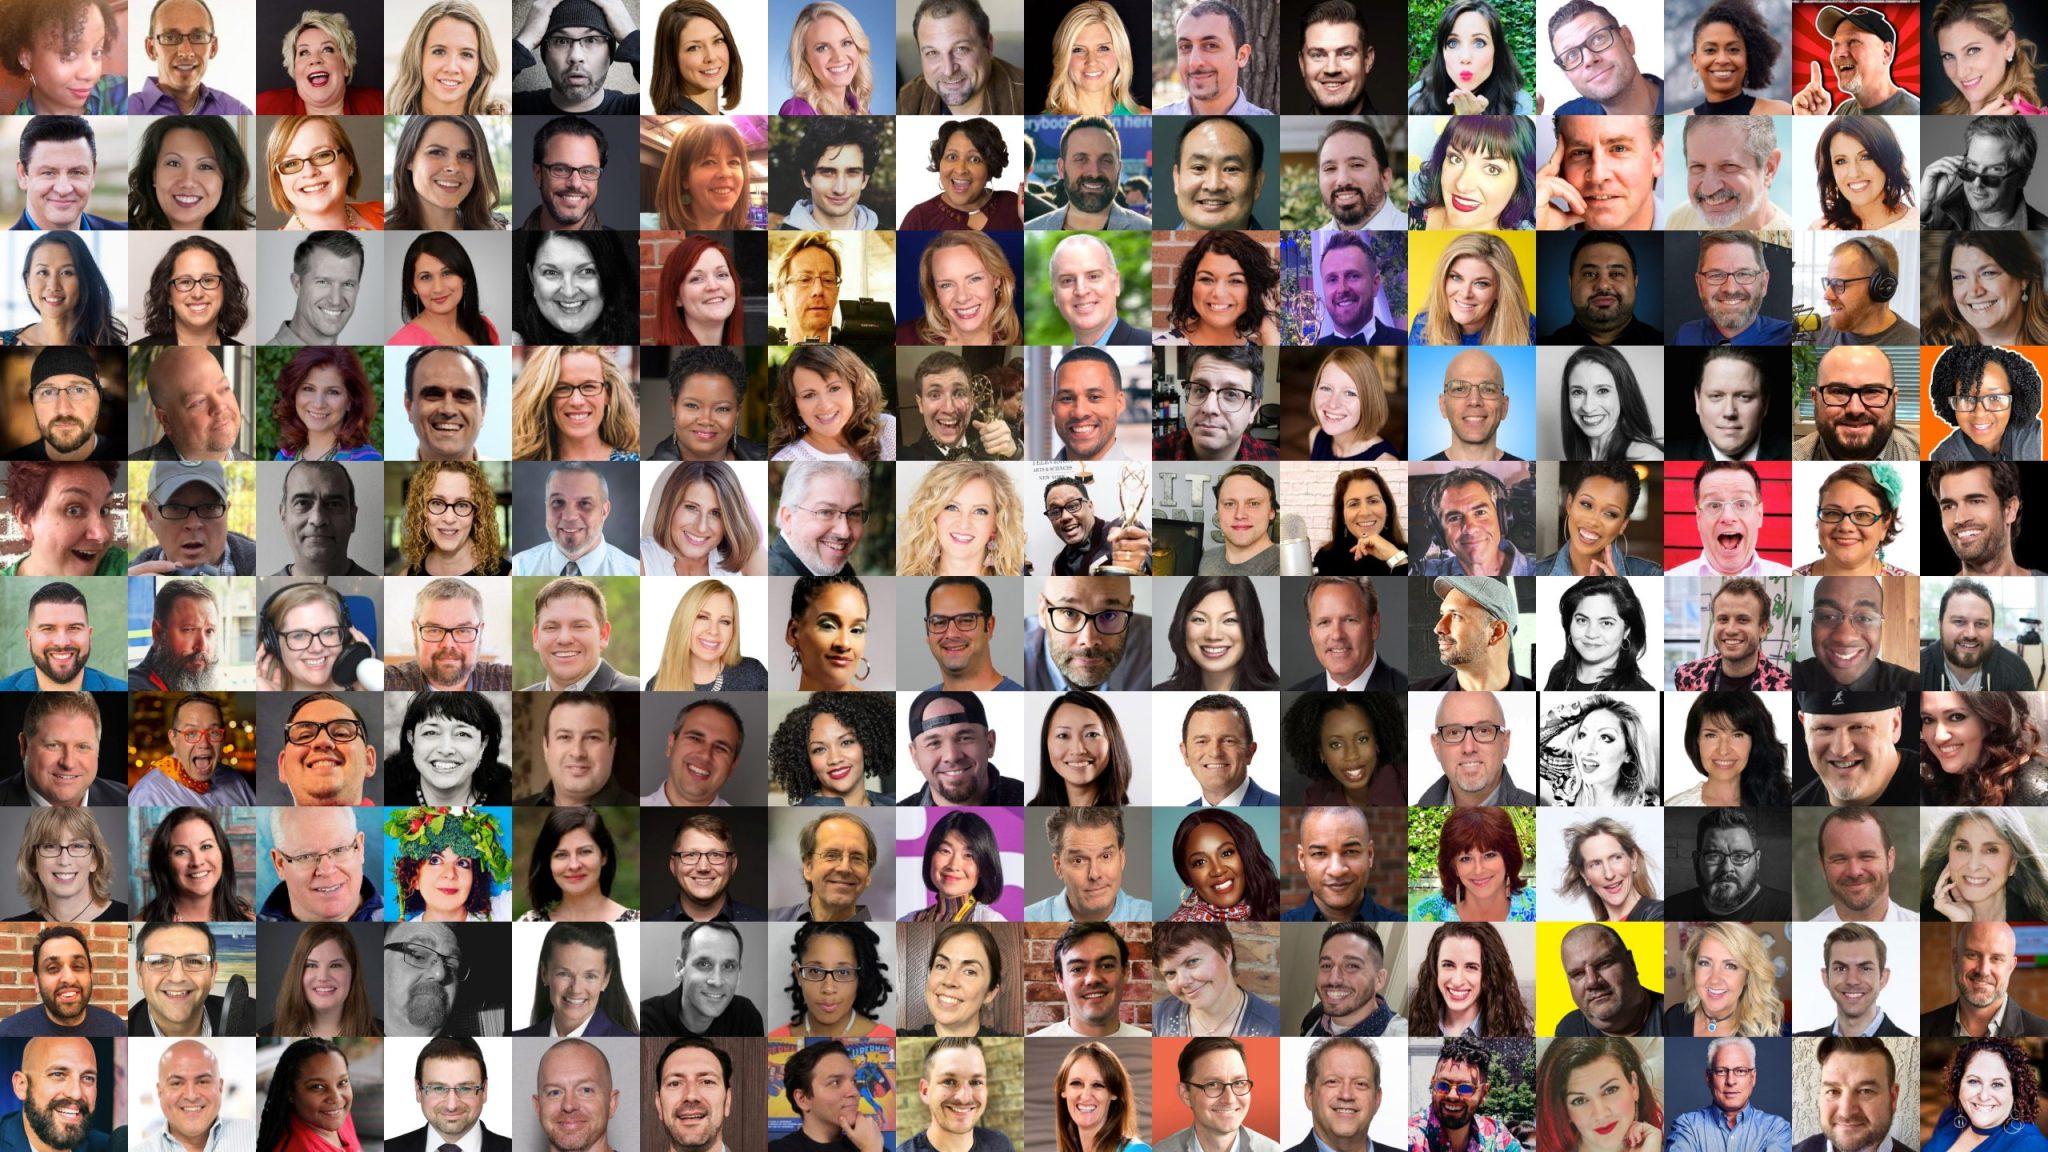 Live Streaming & Digital Media: 160 Predictions for 2020